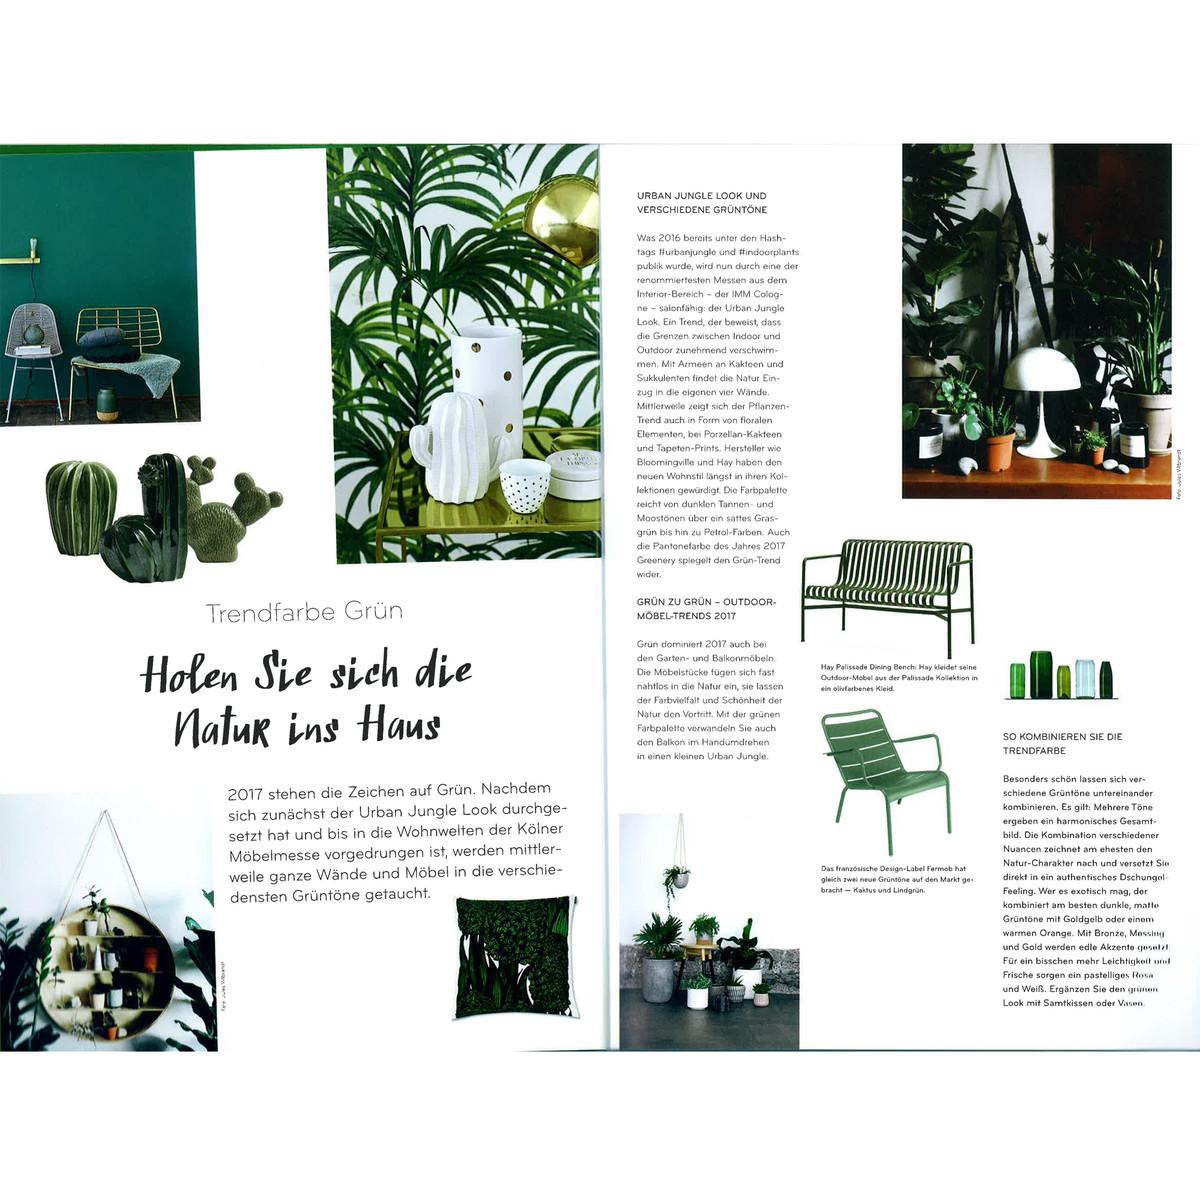 ikea katalog 2016 bestellen katalogbestellung wohndesign. Black Bedroom Furniture Sets. Home Design Ideas